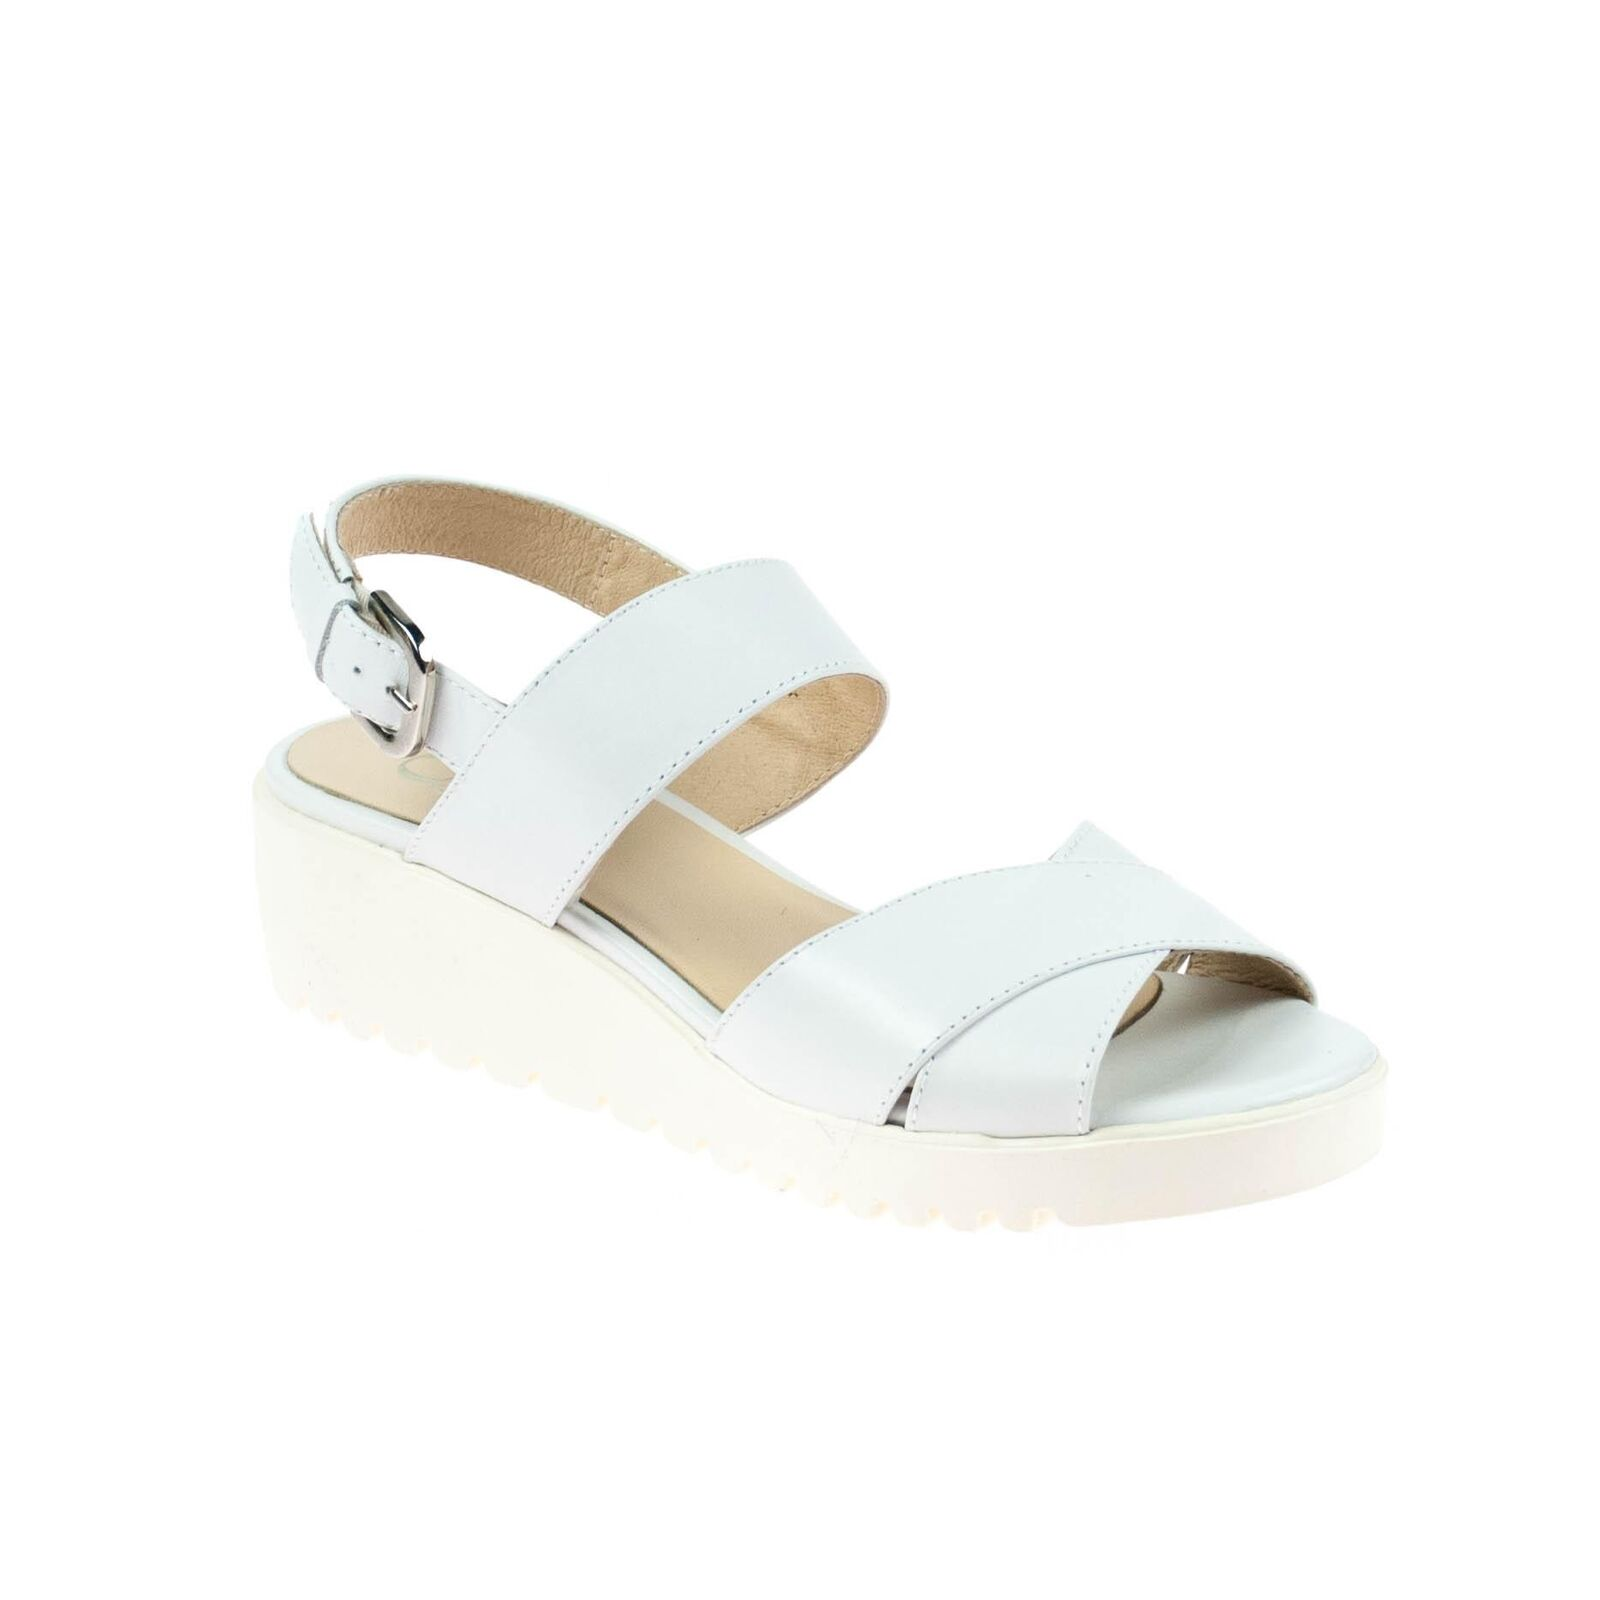 Último gran descuento Gadea Damen Sandale Leder Weiß